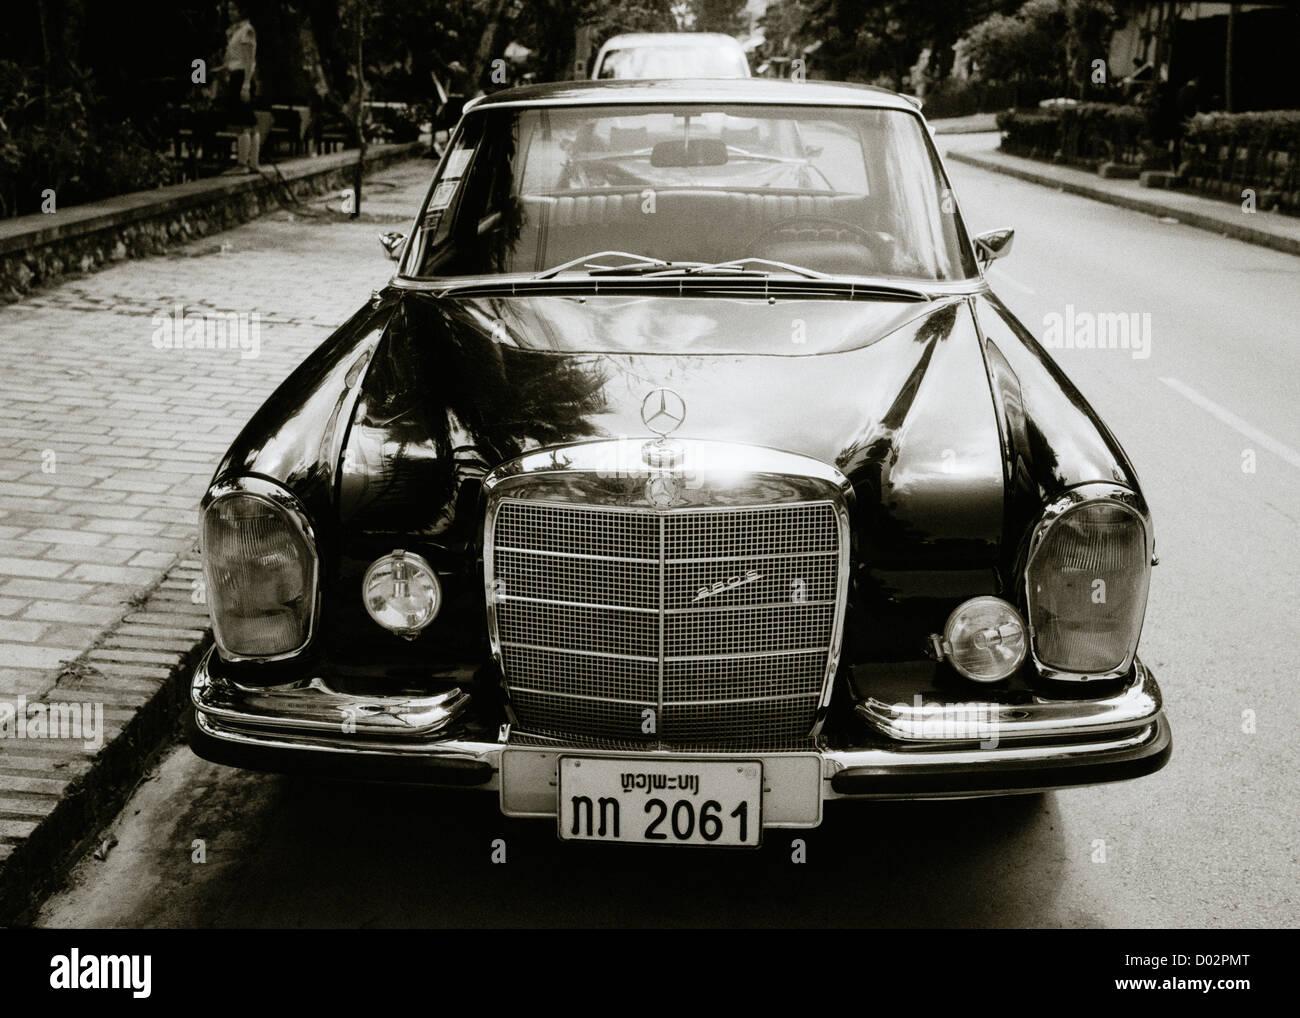 Classic Vintage Car. A classic Mercedes Benz car. Cars Vehicle ...